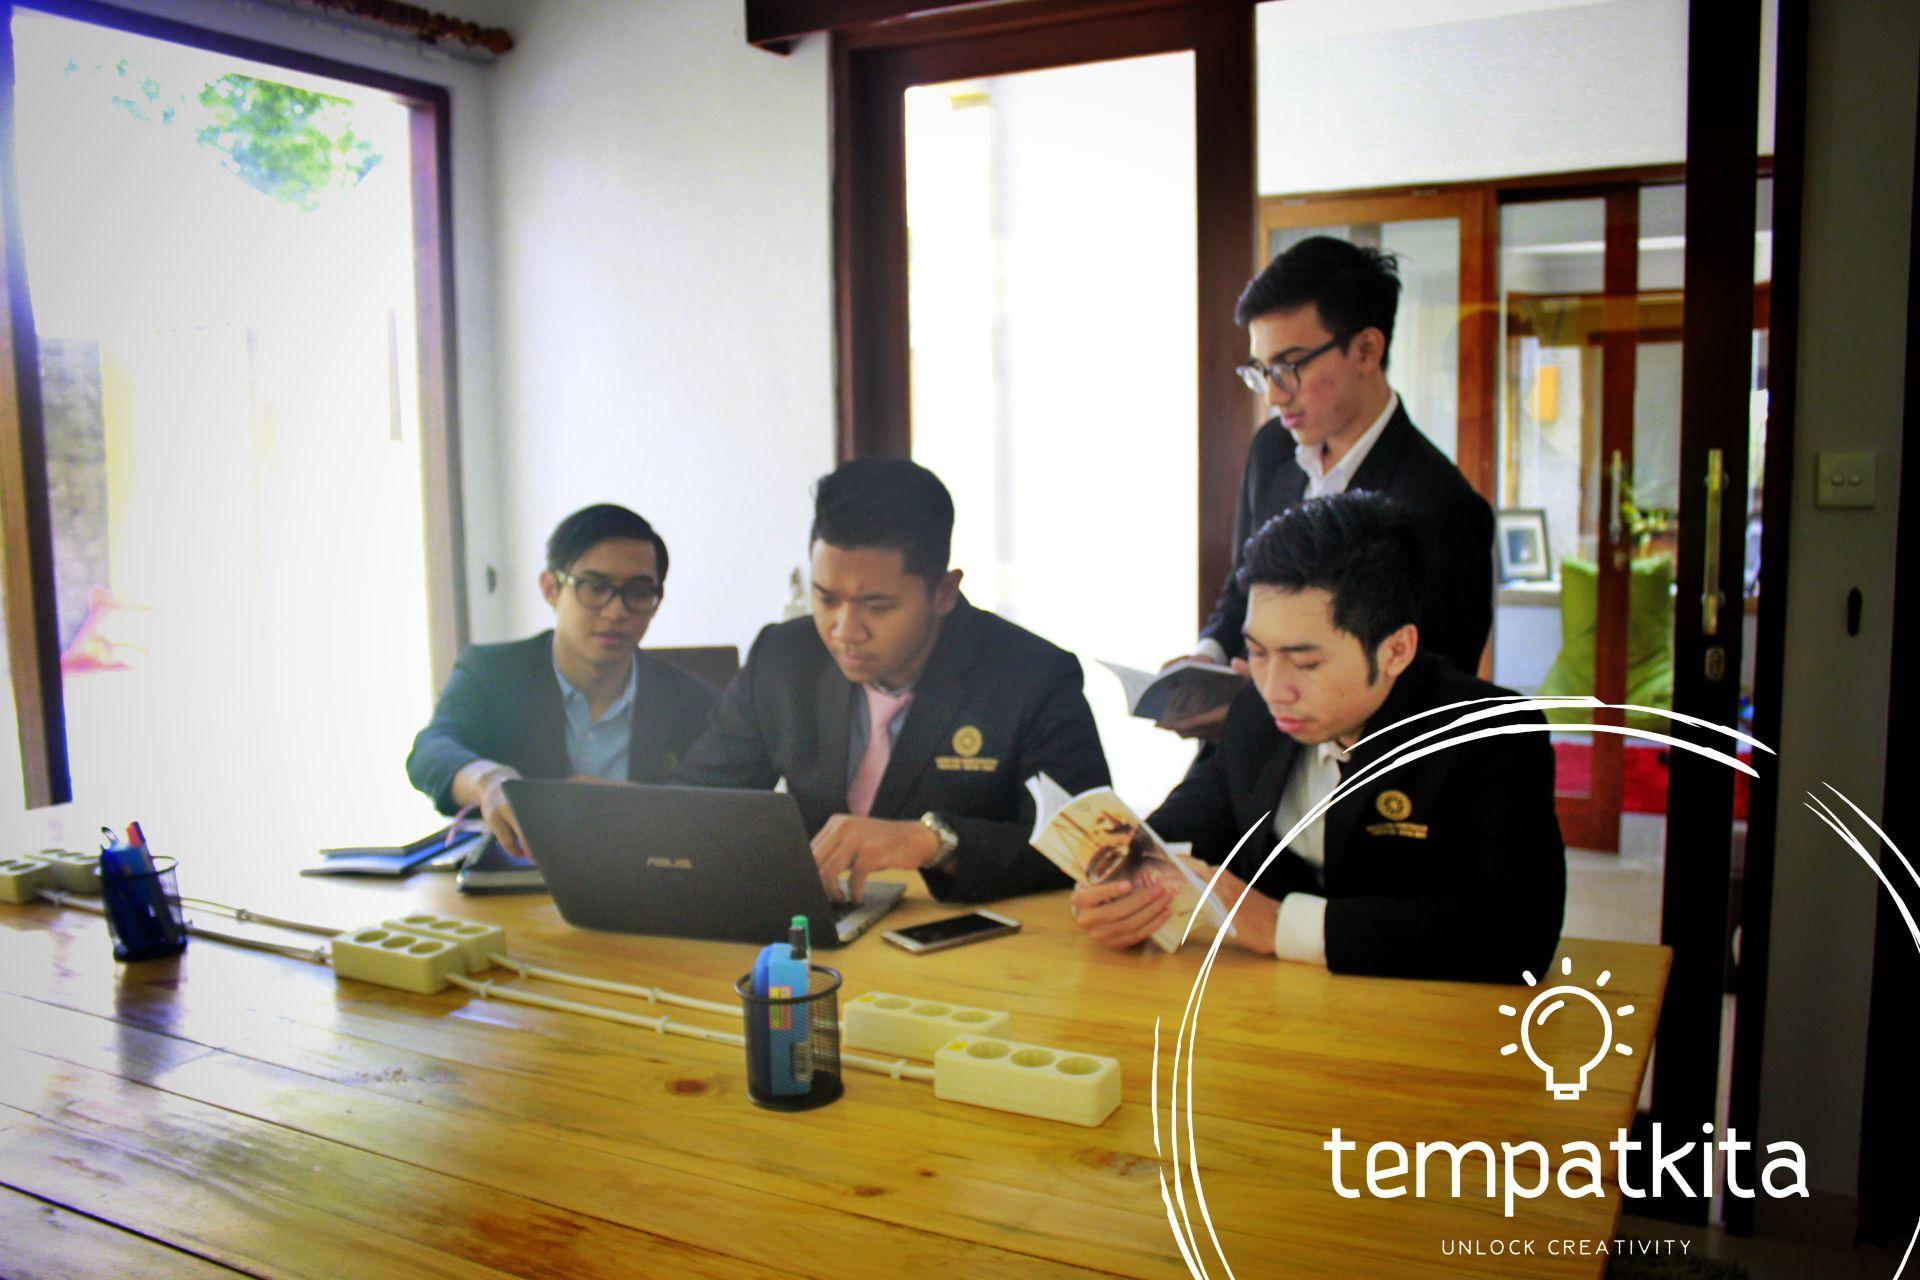 tempatkita Coworking Space, Bali